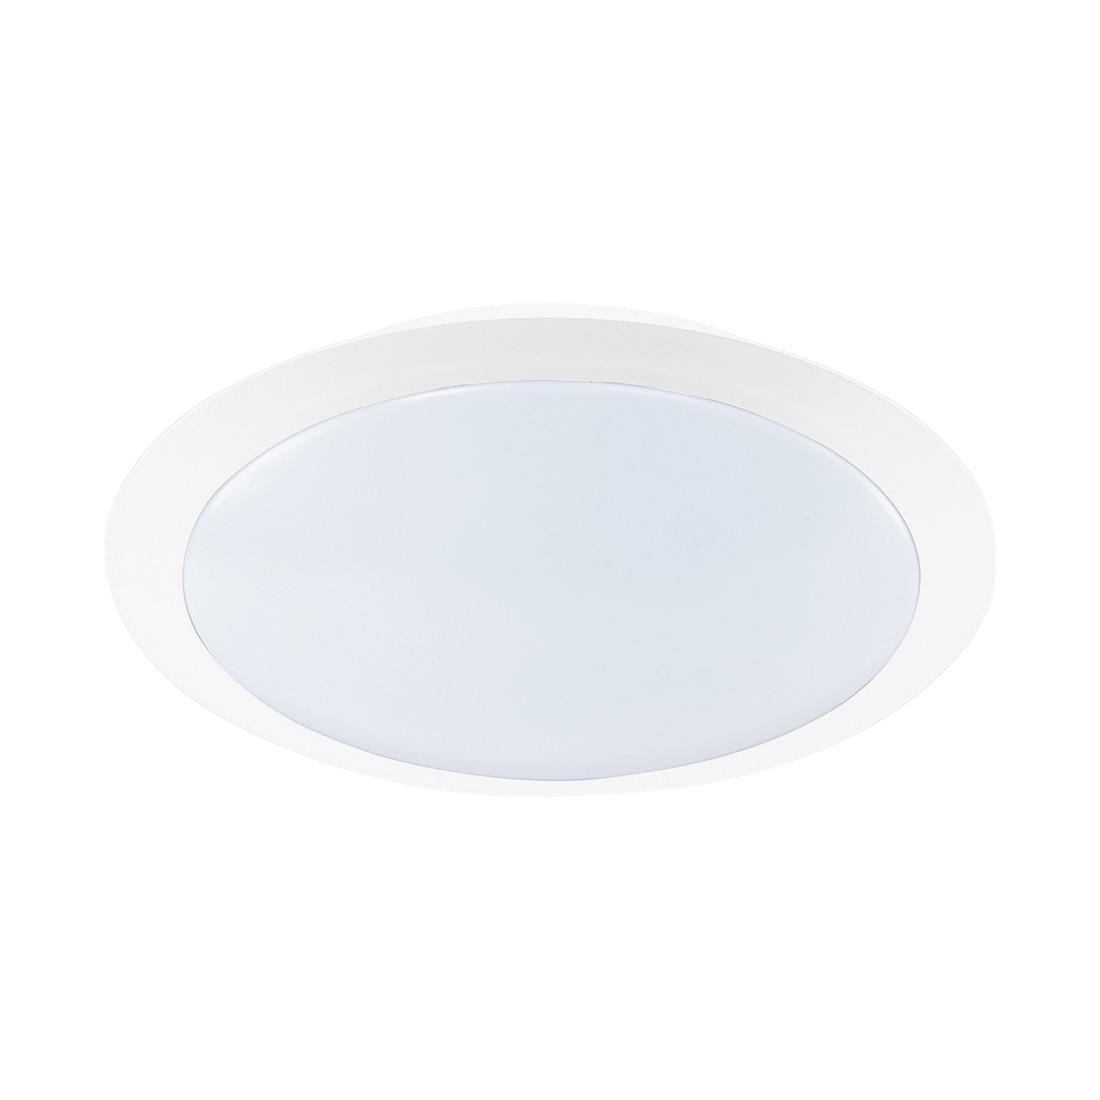 EEK A+, LED-Deckenleuchte - Weiß - 1-flammig, Trio